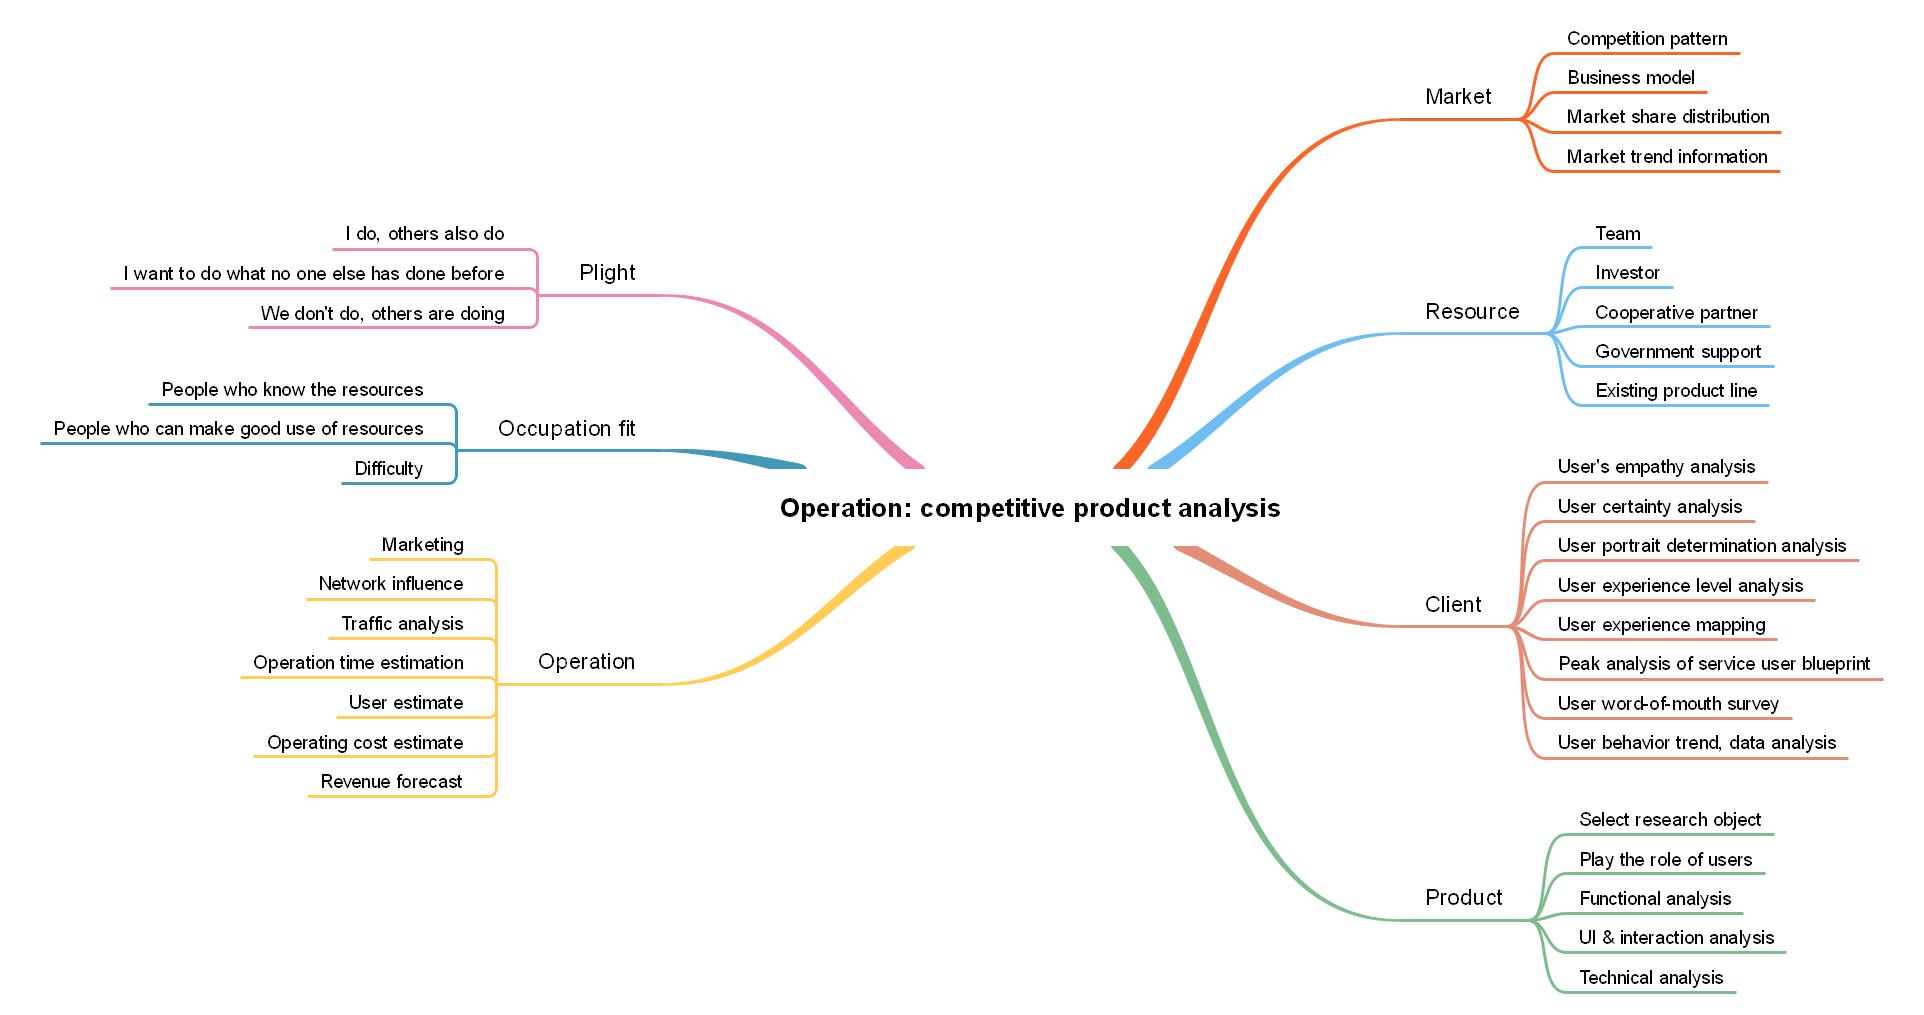 Betrieb: Wettbewerbsfähige Produktanalyse